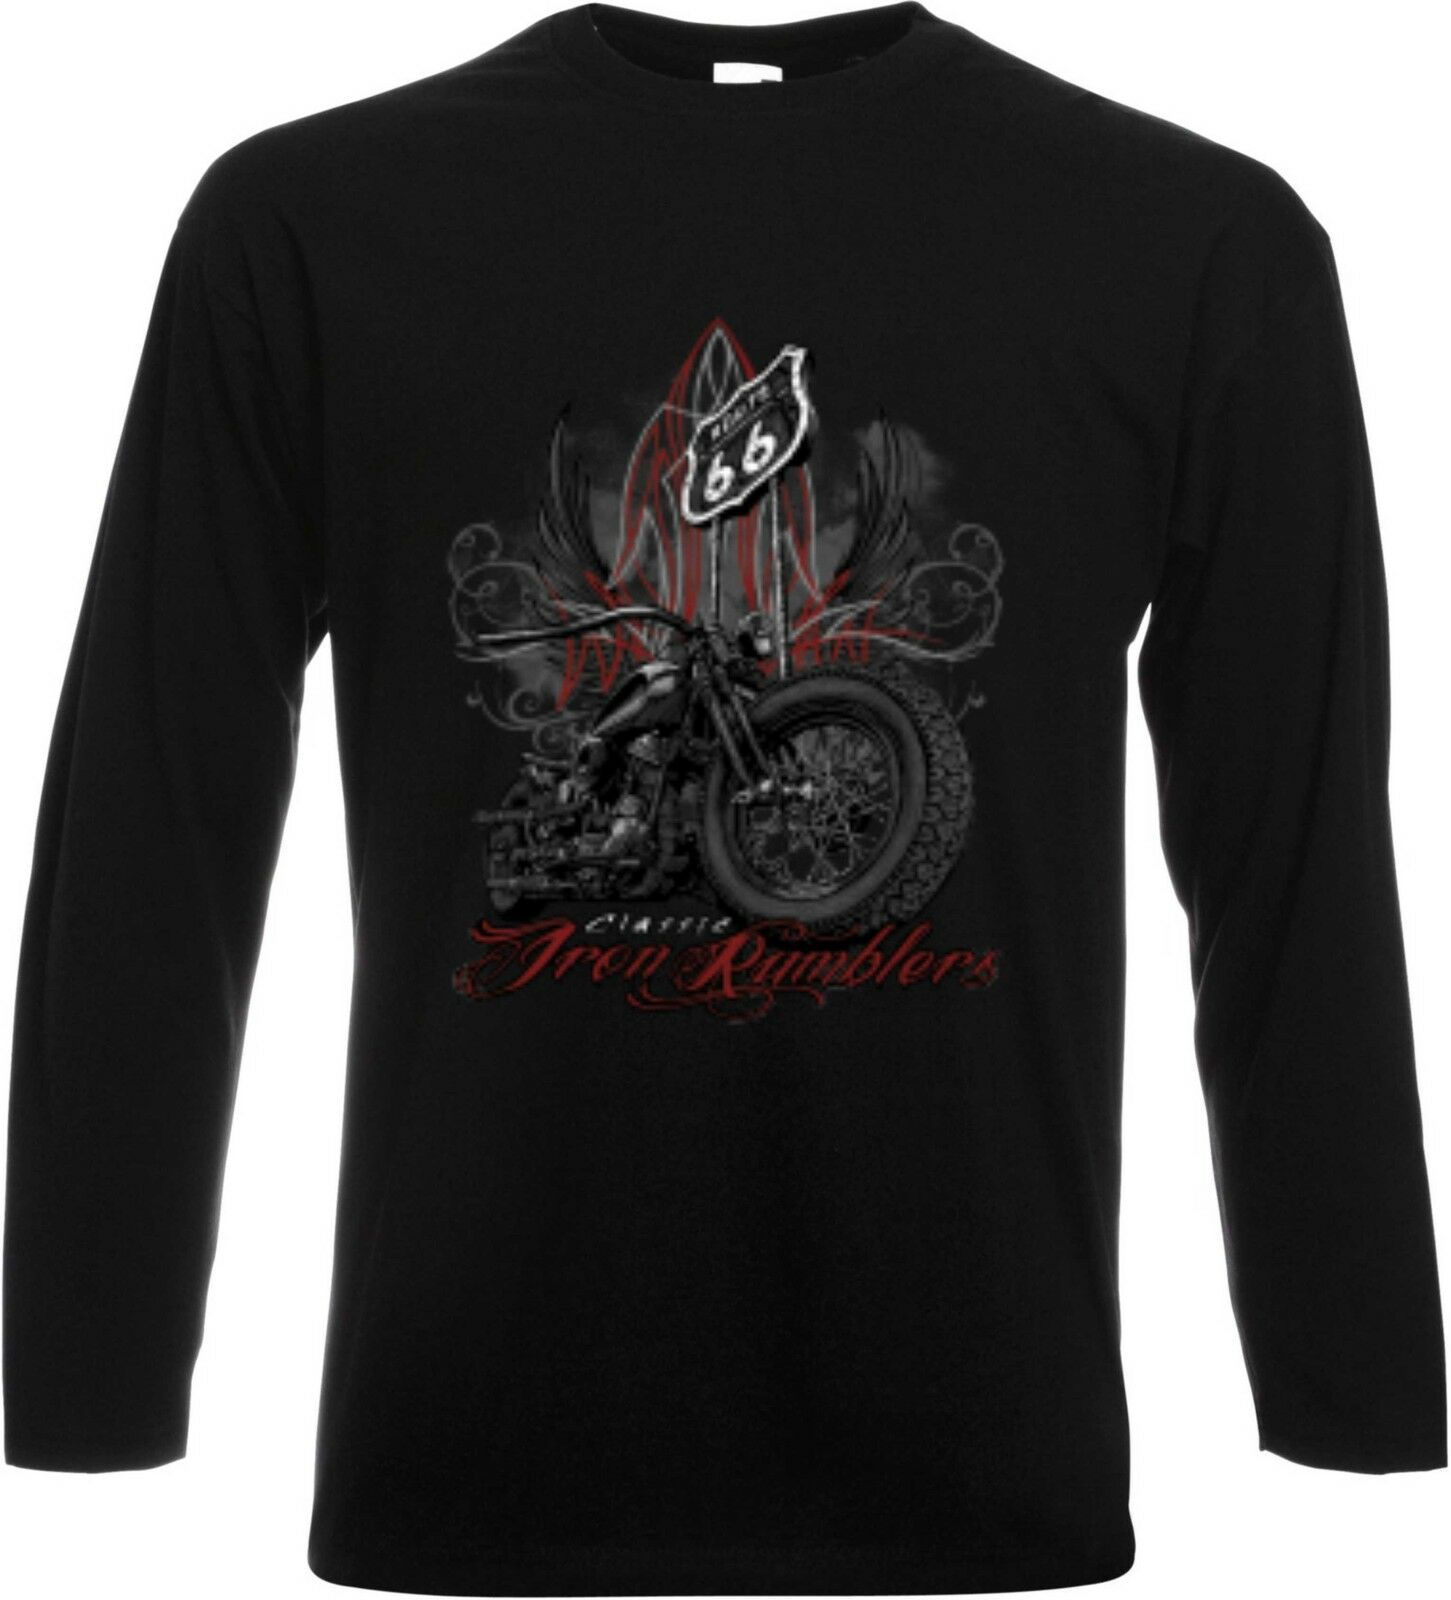 à manches T-shirt longues / T-shirt manches noir HD motard chopper & oldschoolmotiv HOTPANTS 208c26